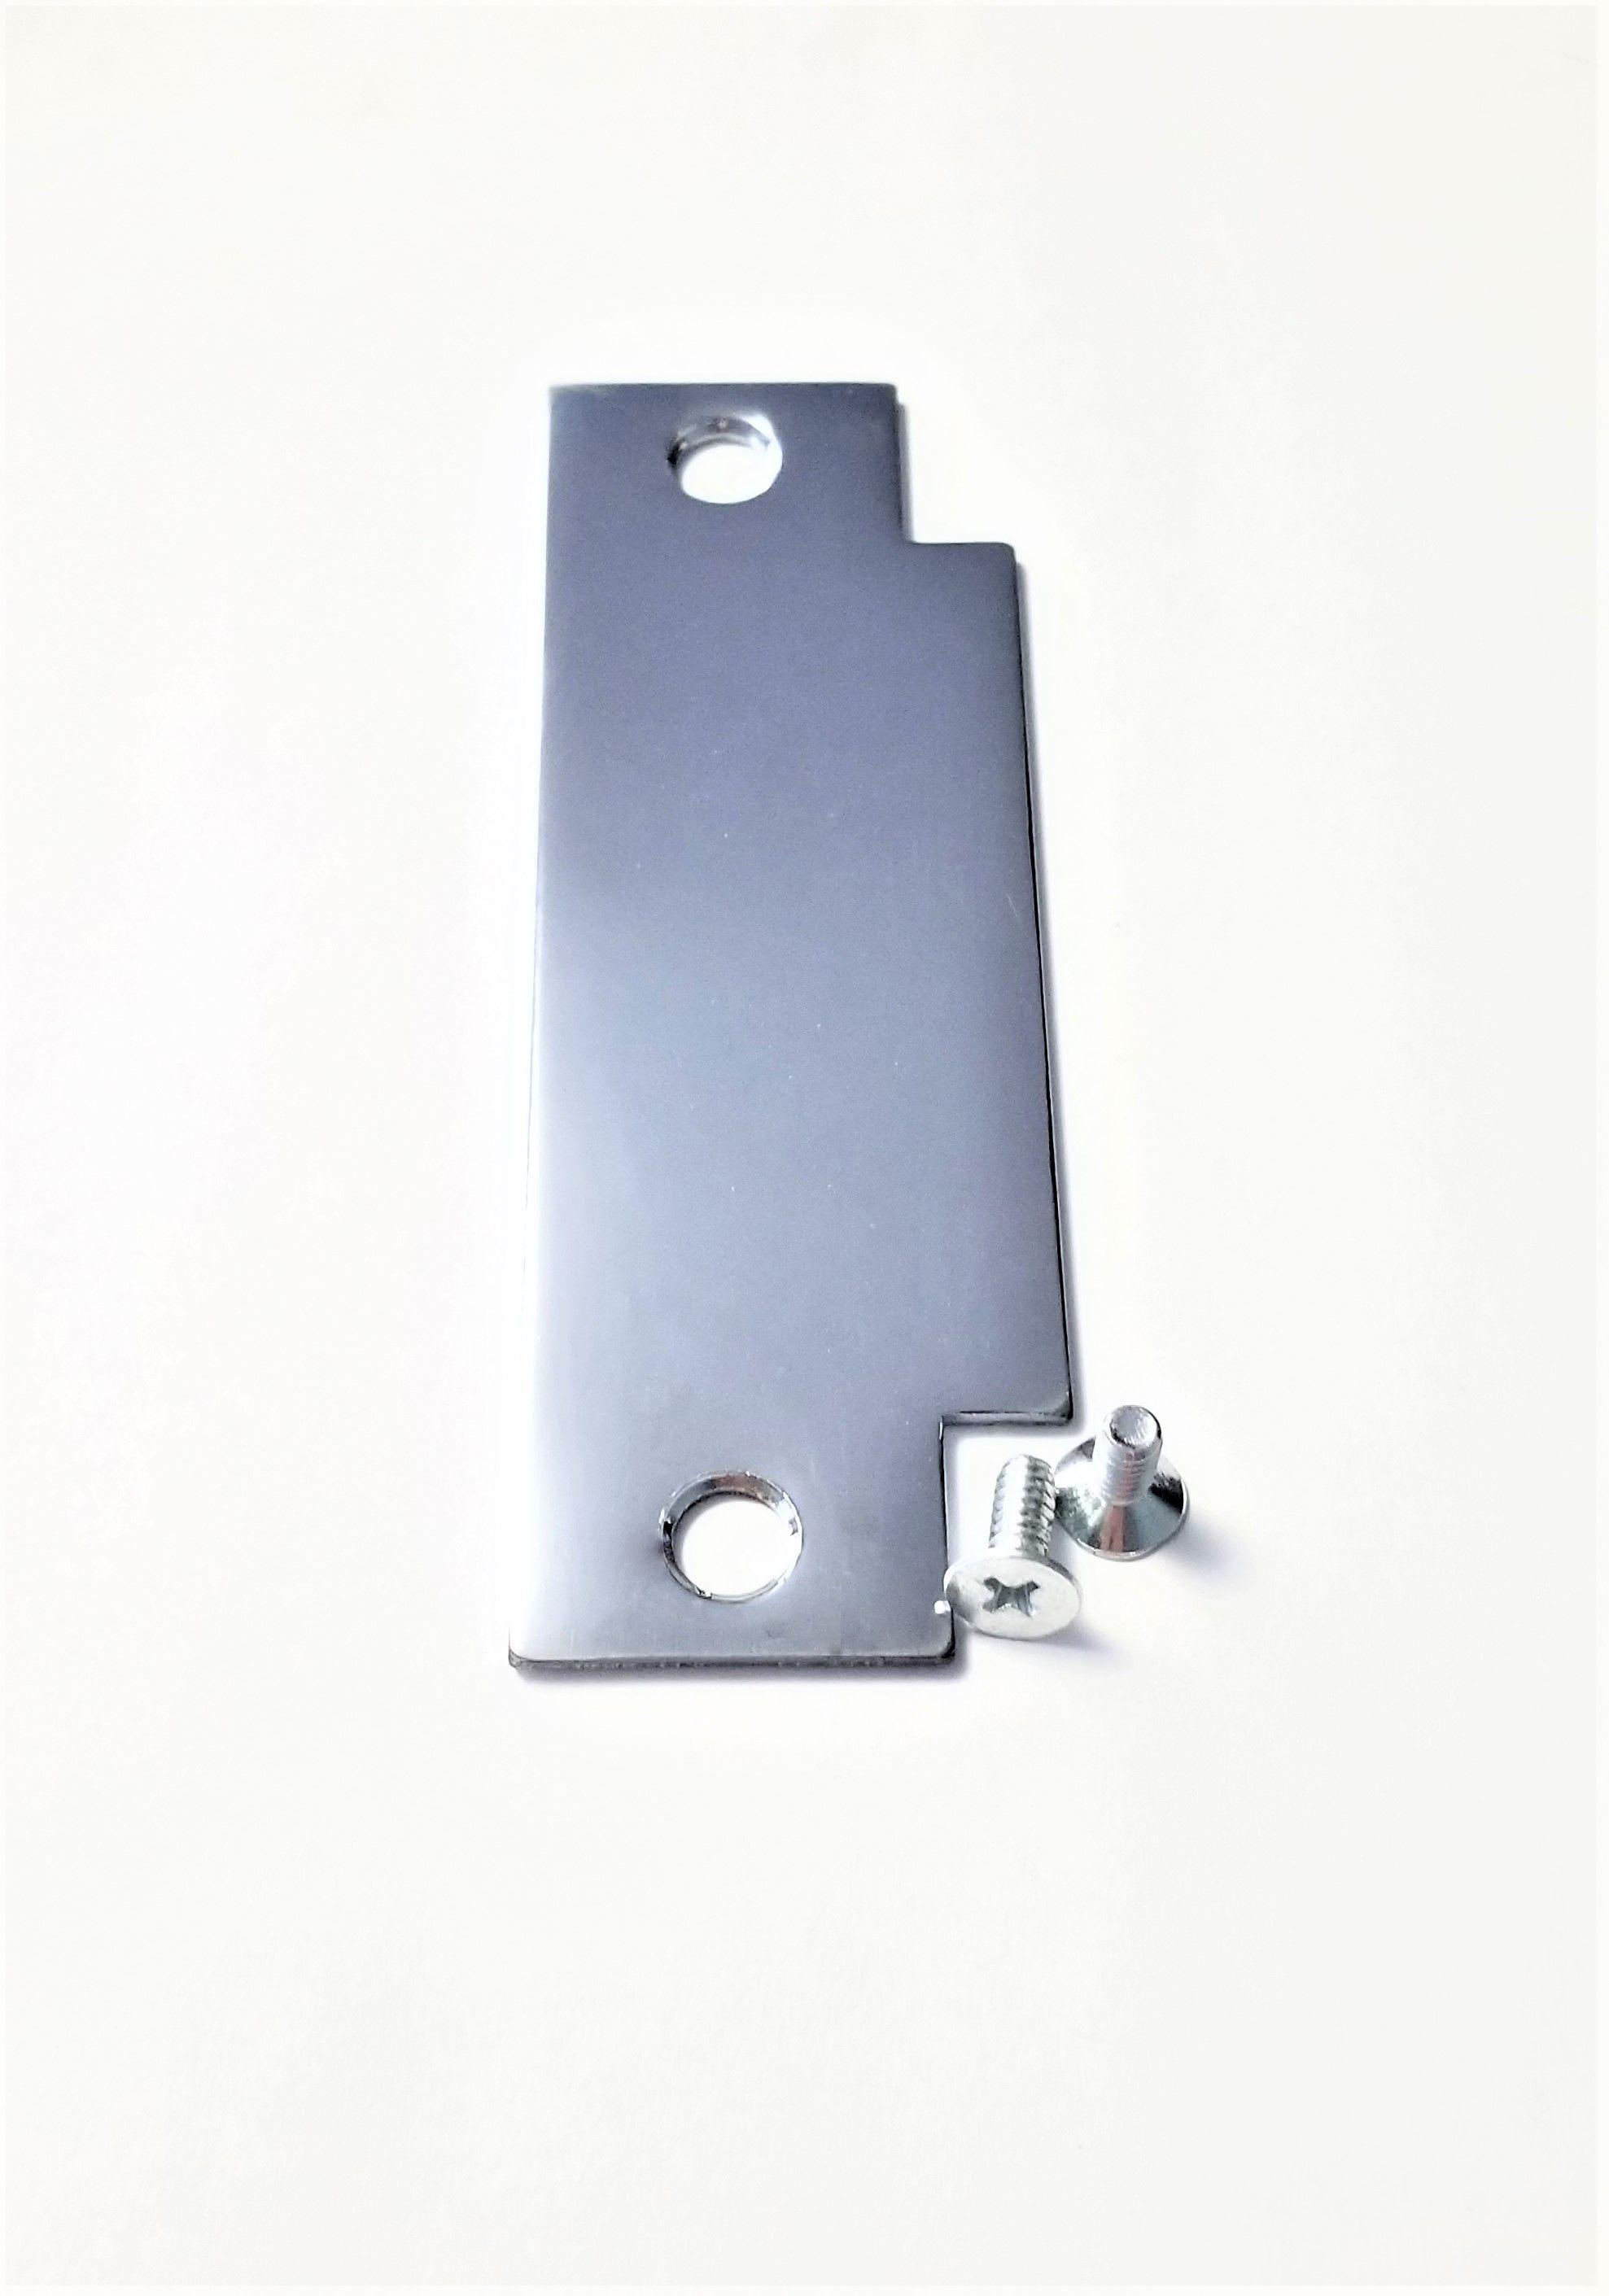 Filler Plate By Tuff Strike Securely Covers Removed Strike Plates Tuffstrike Doorhardware Diy Doorsecurity Door Reinforcement Security Door Door Hardware